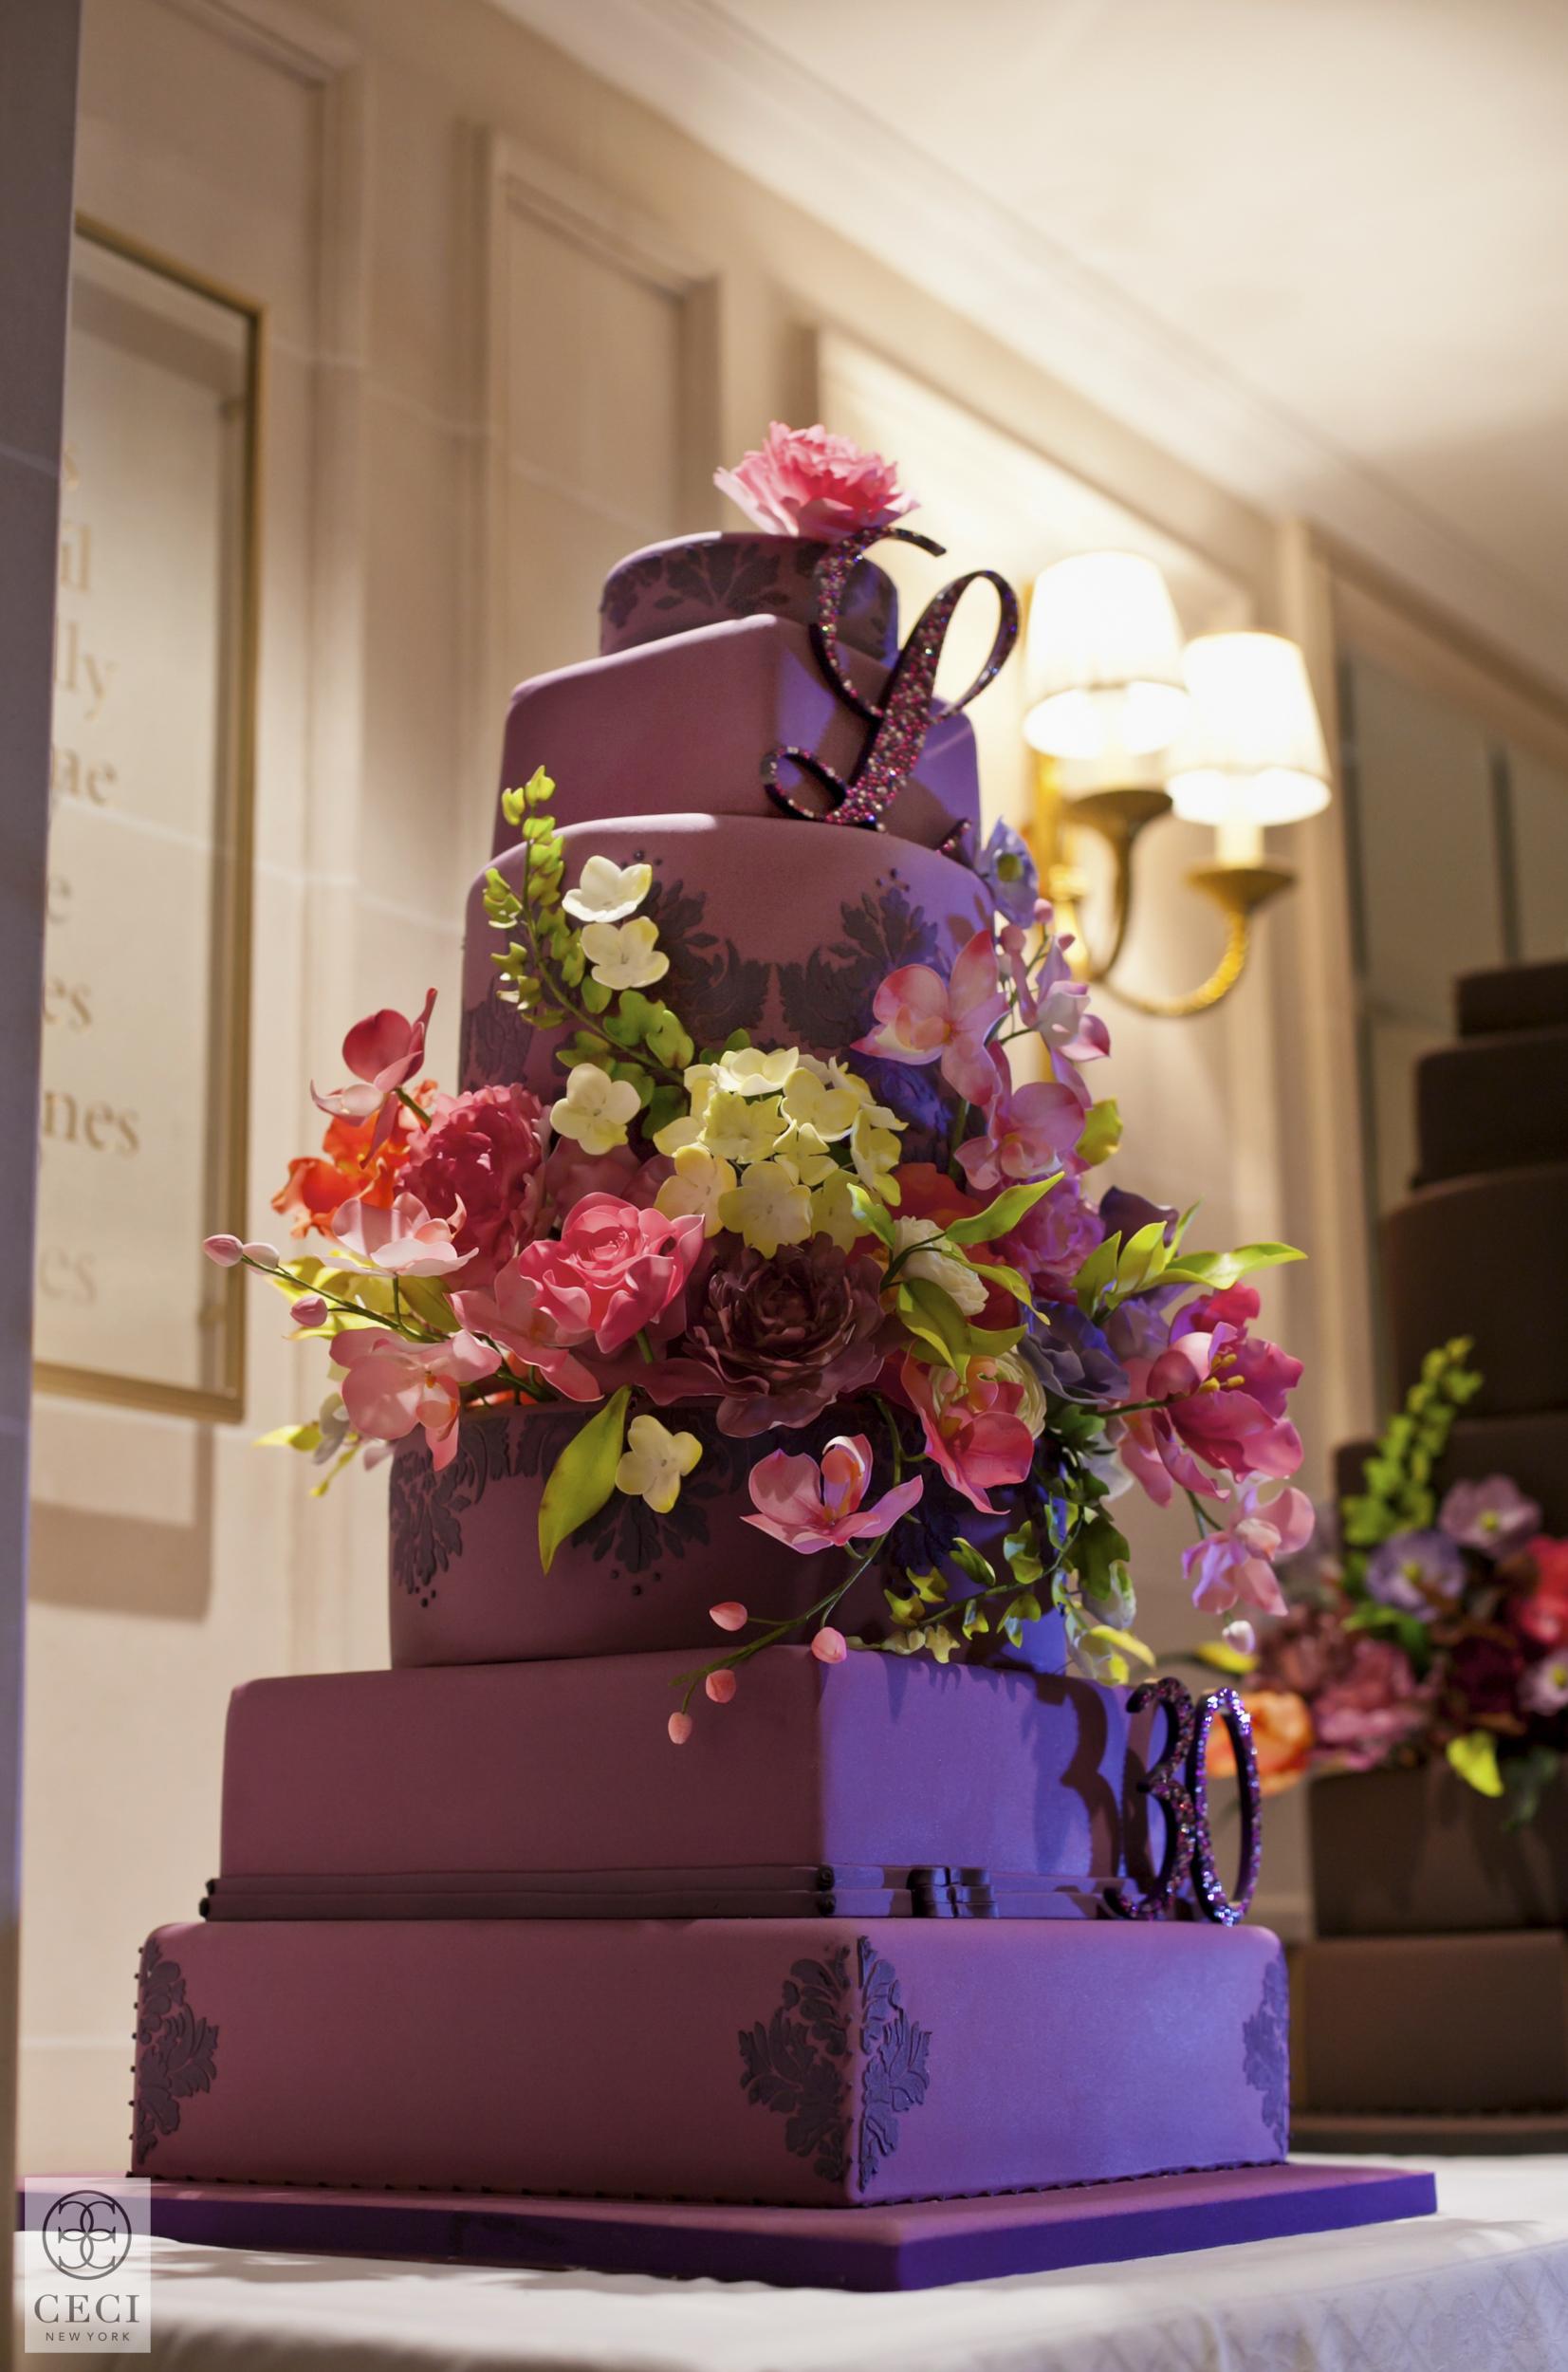 ceci_new_york_lucas_somoza_purple_regal_wediding_birthday_commitment_ceremony_gold-33.jpg